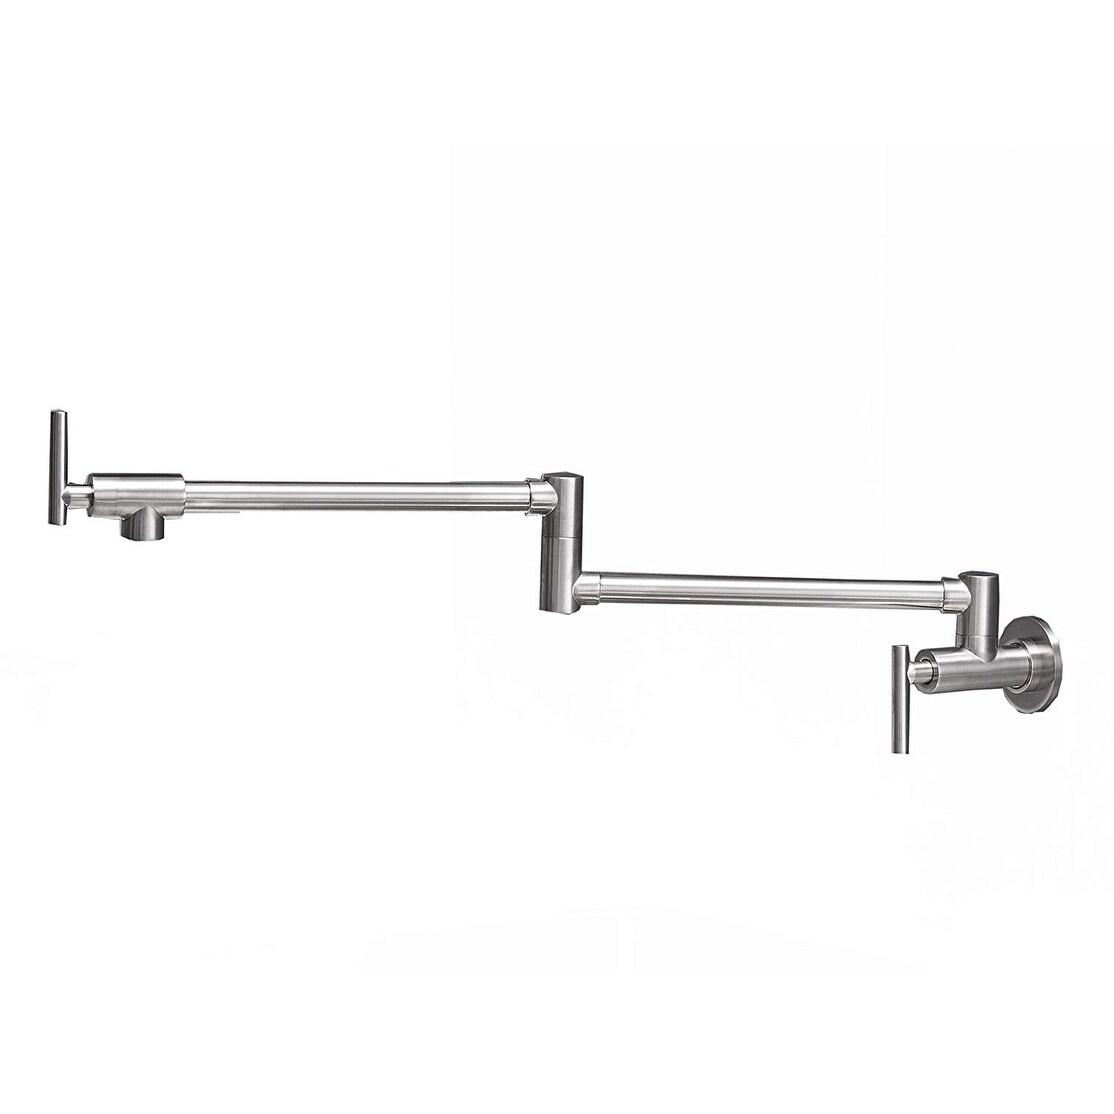 Vibrantbath Wall Mount Single Handle Pot Filler Kitchen Faucet Swing Swivel  Spout